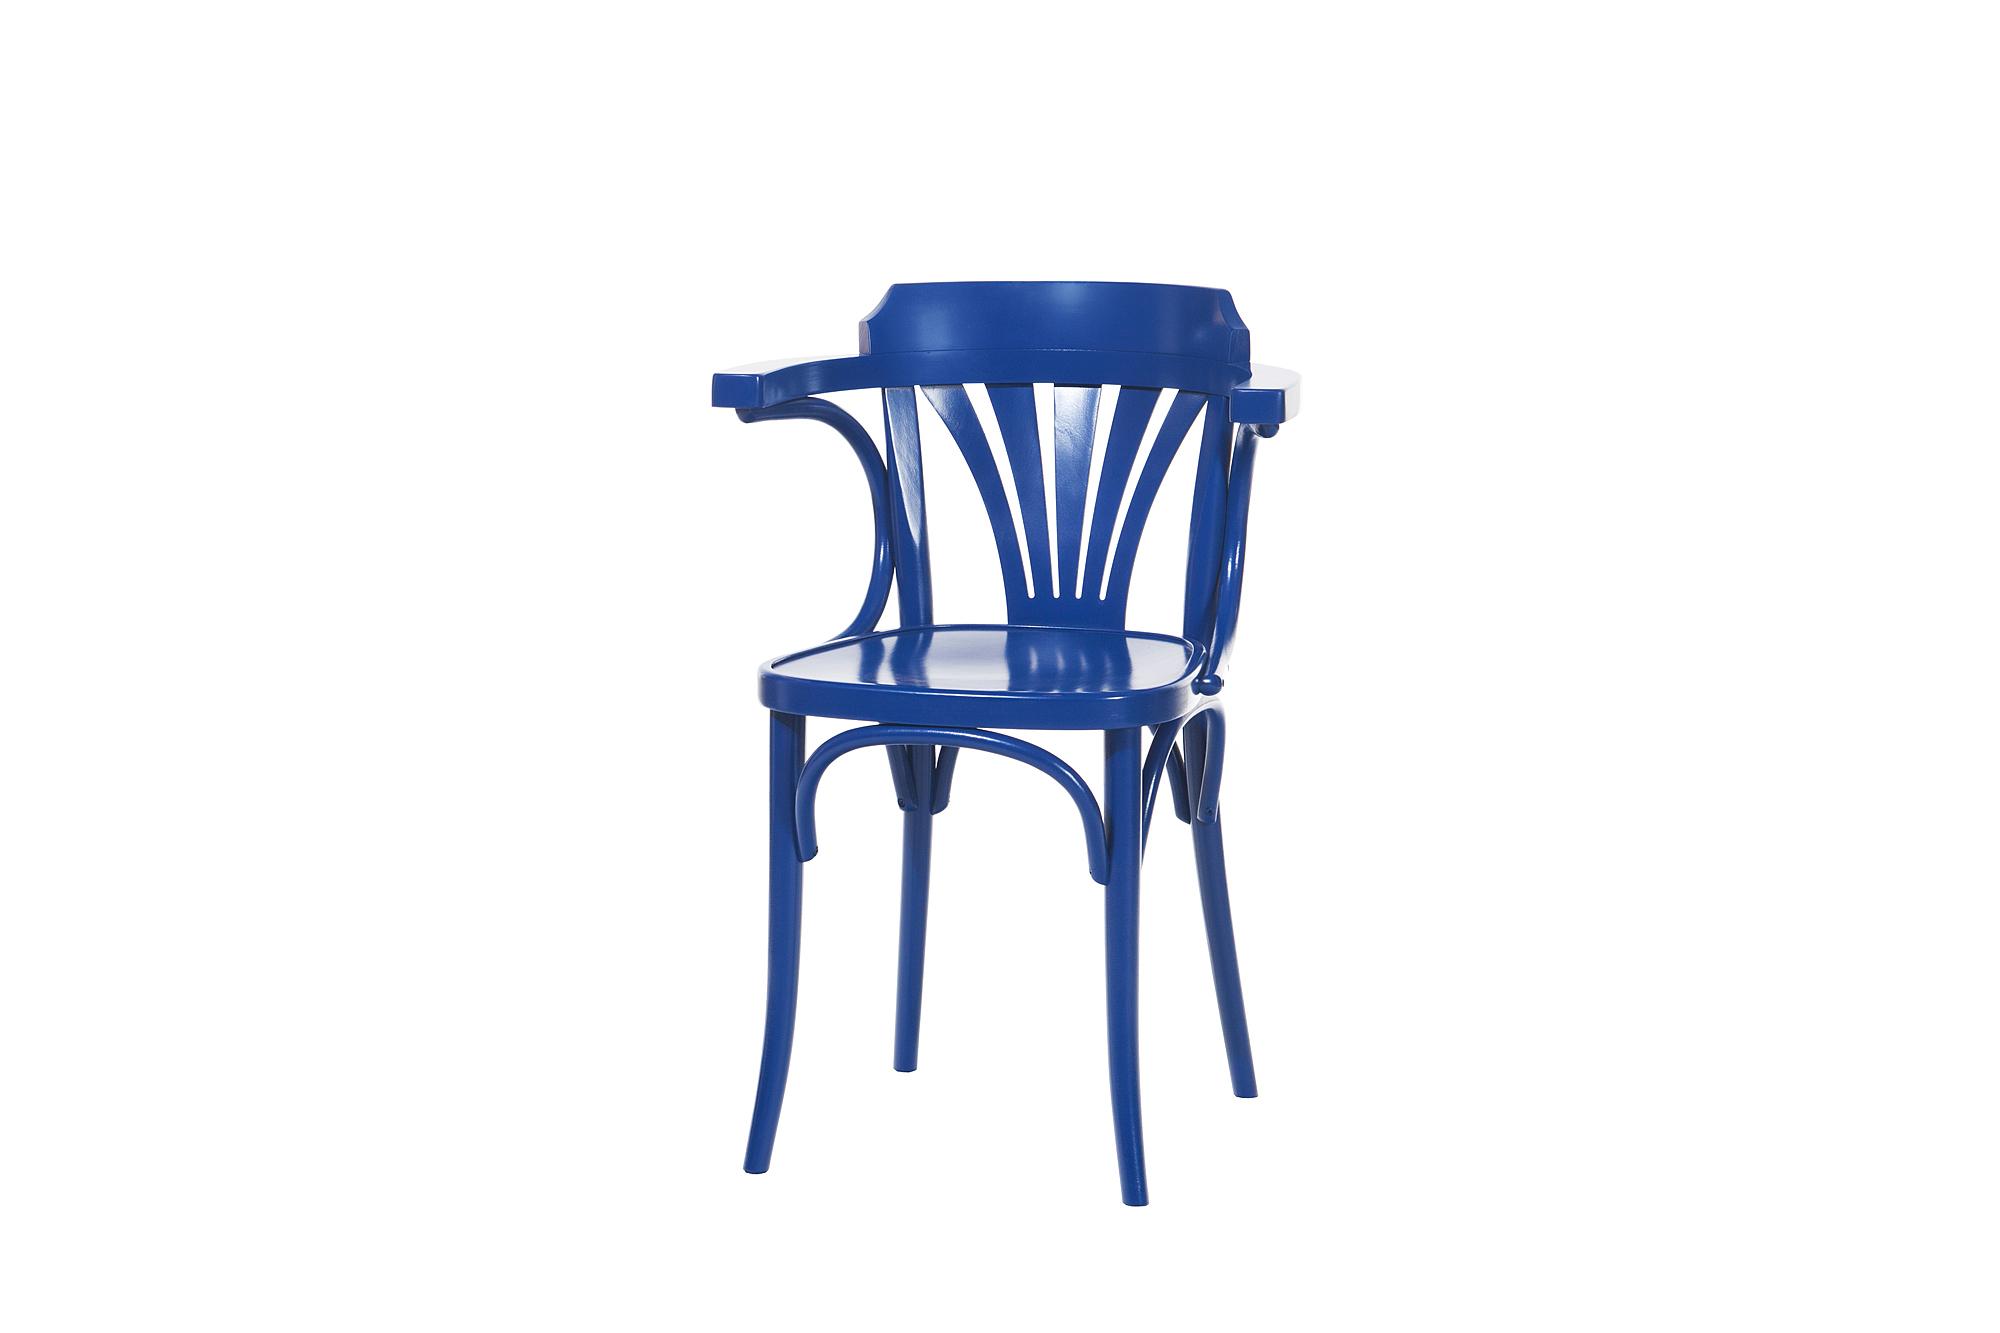 Scaun din lemn de fag 24 Blue, l54xA48xH77 cm imagine